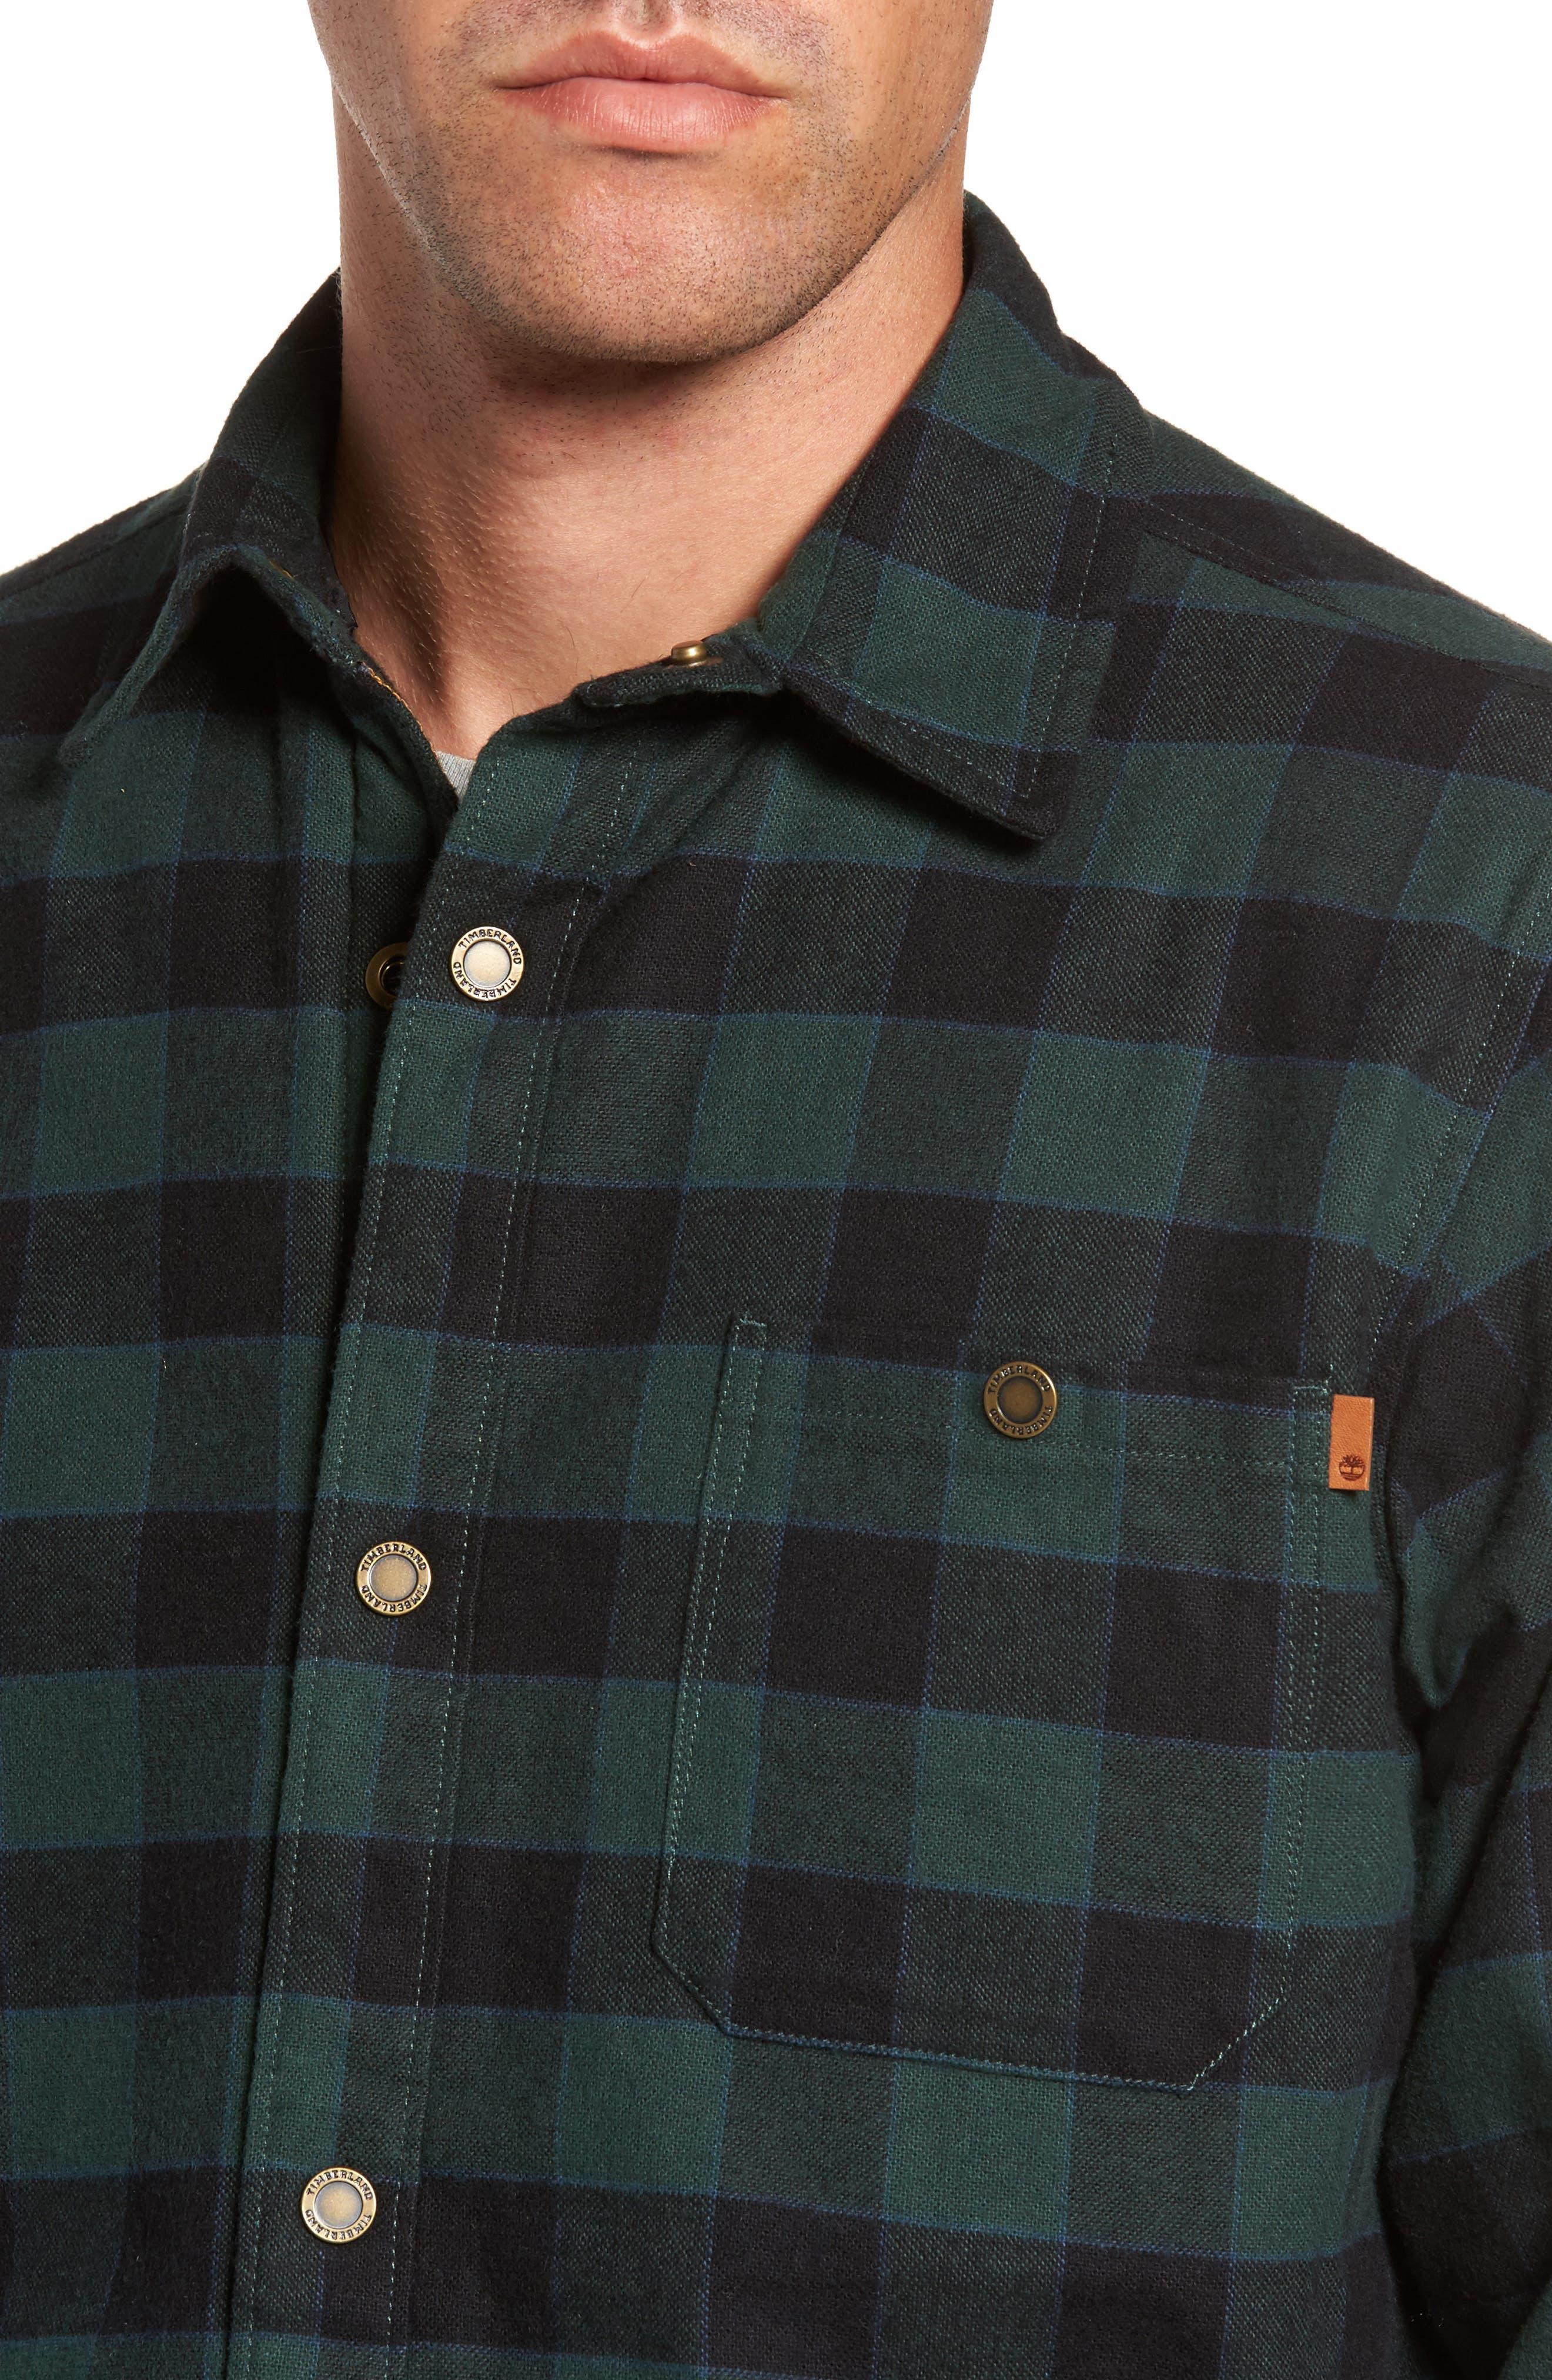 Check Shirt Jacket with Faux Shearling Lining,                             Alternate thumbnail 4, color,                             301